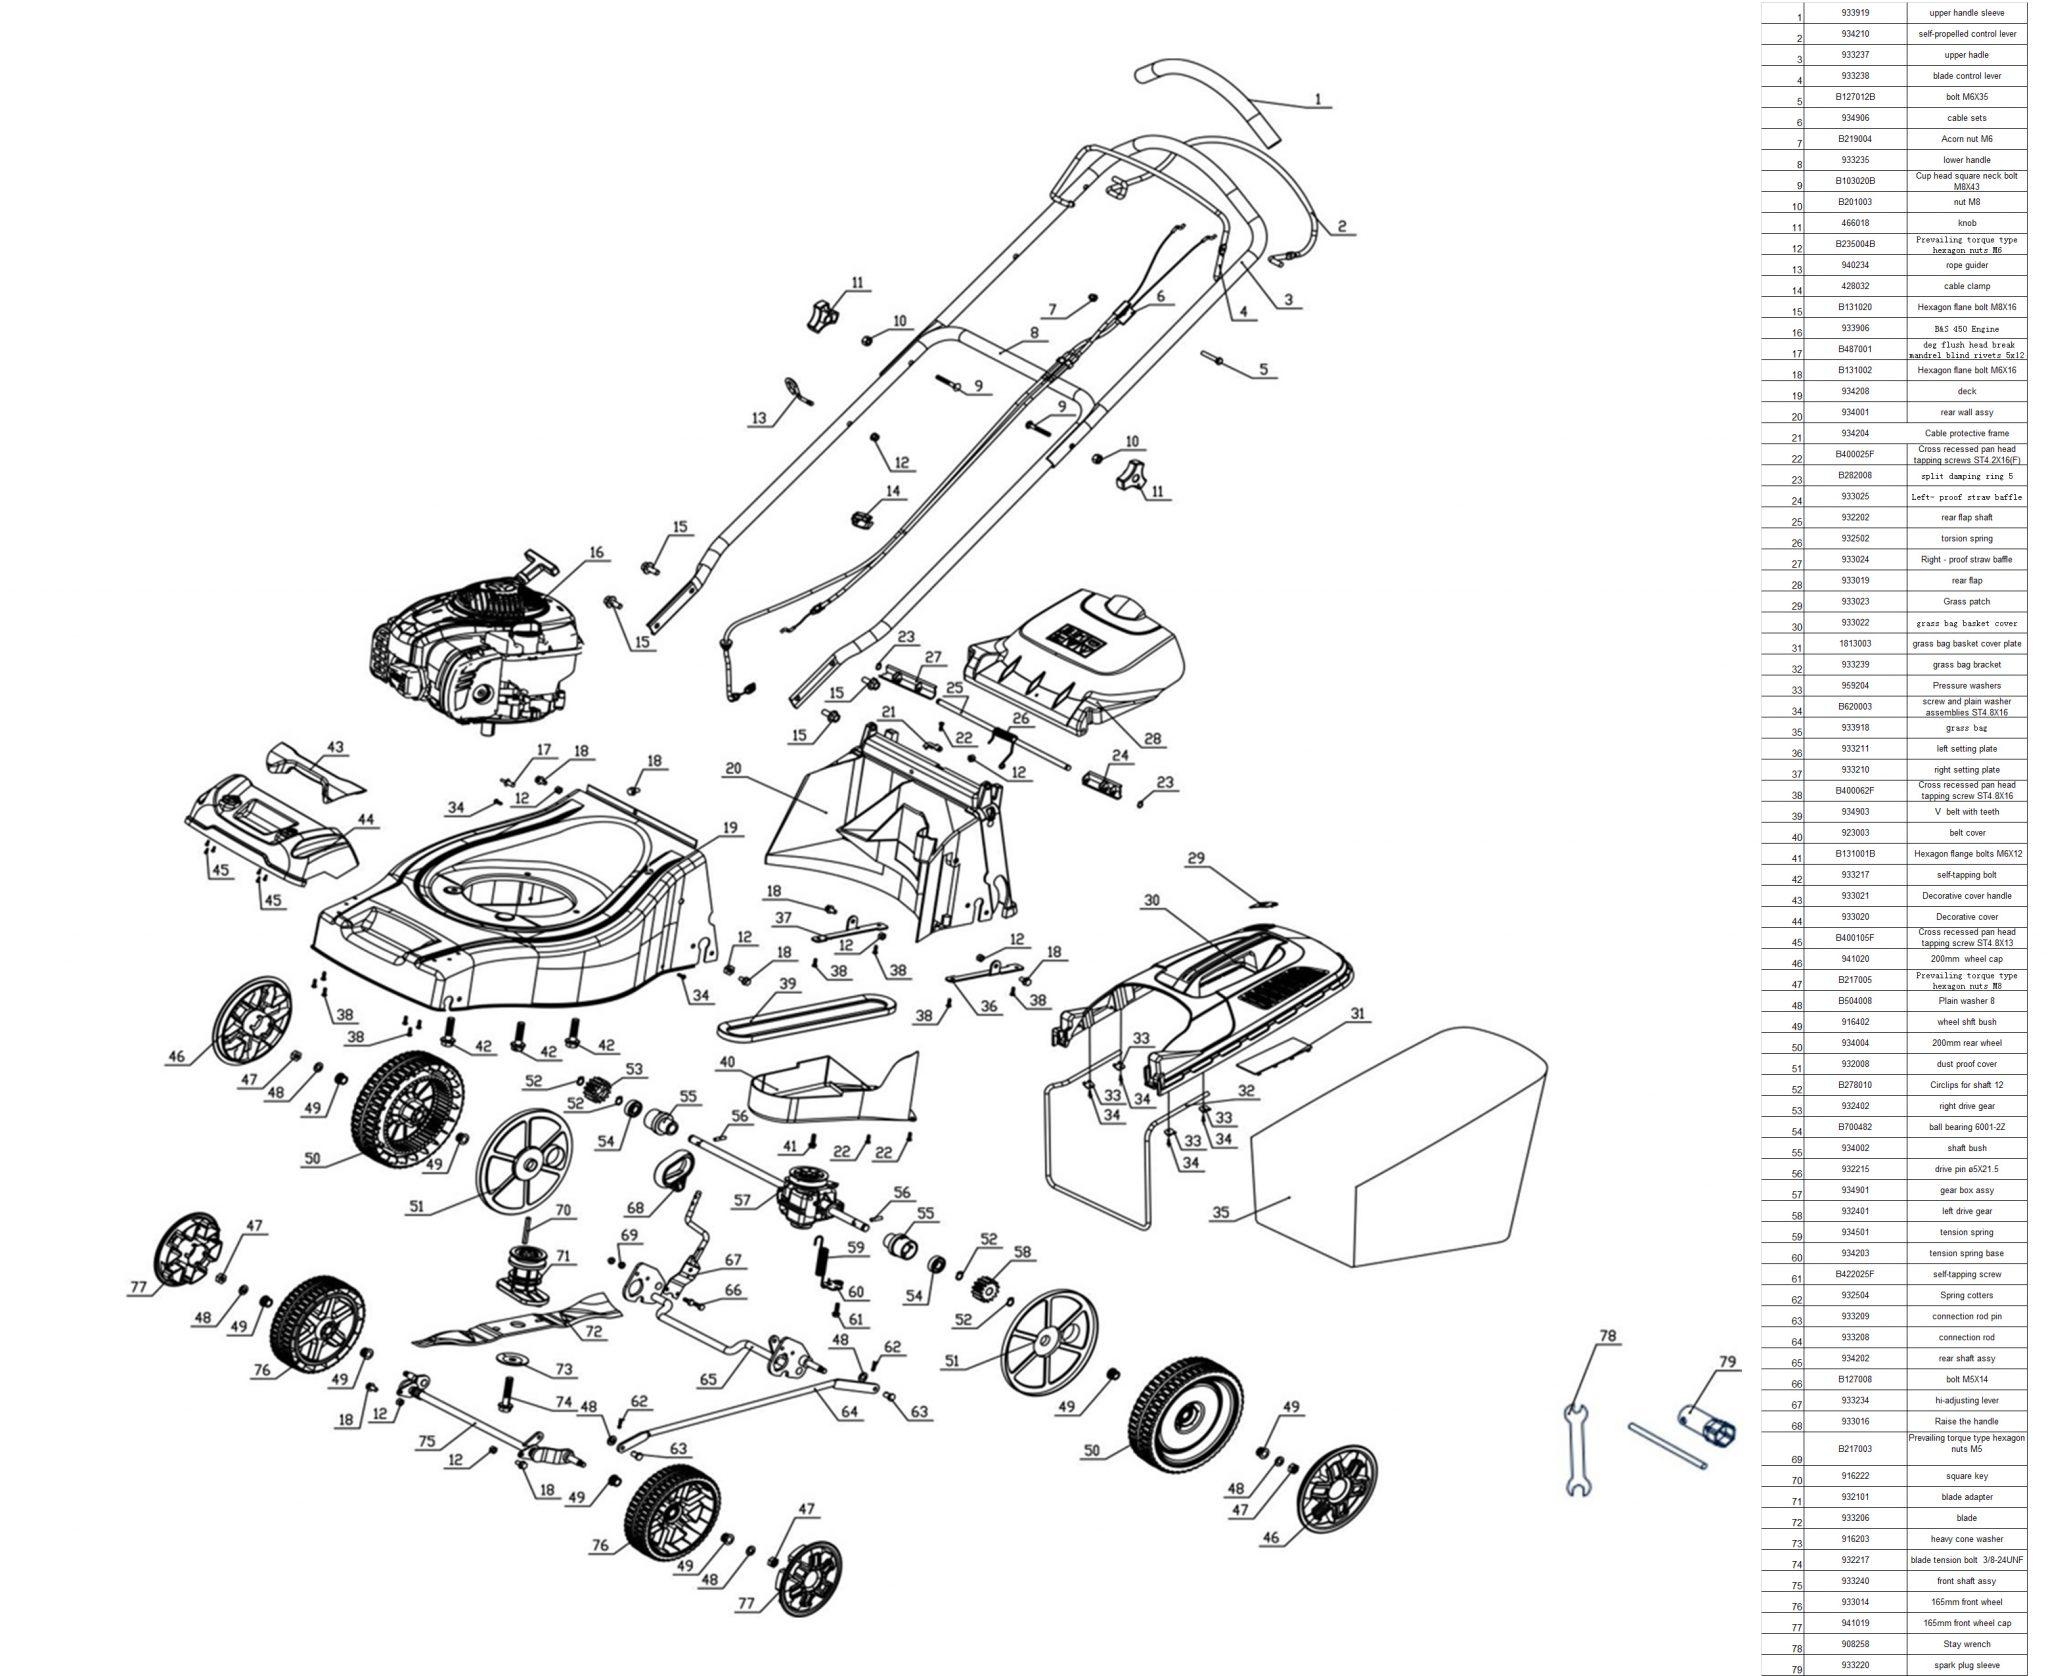 Qualcast 41cm Self Propelled Petrol Lawnmower With B Amp S450e